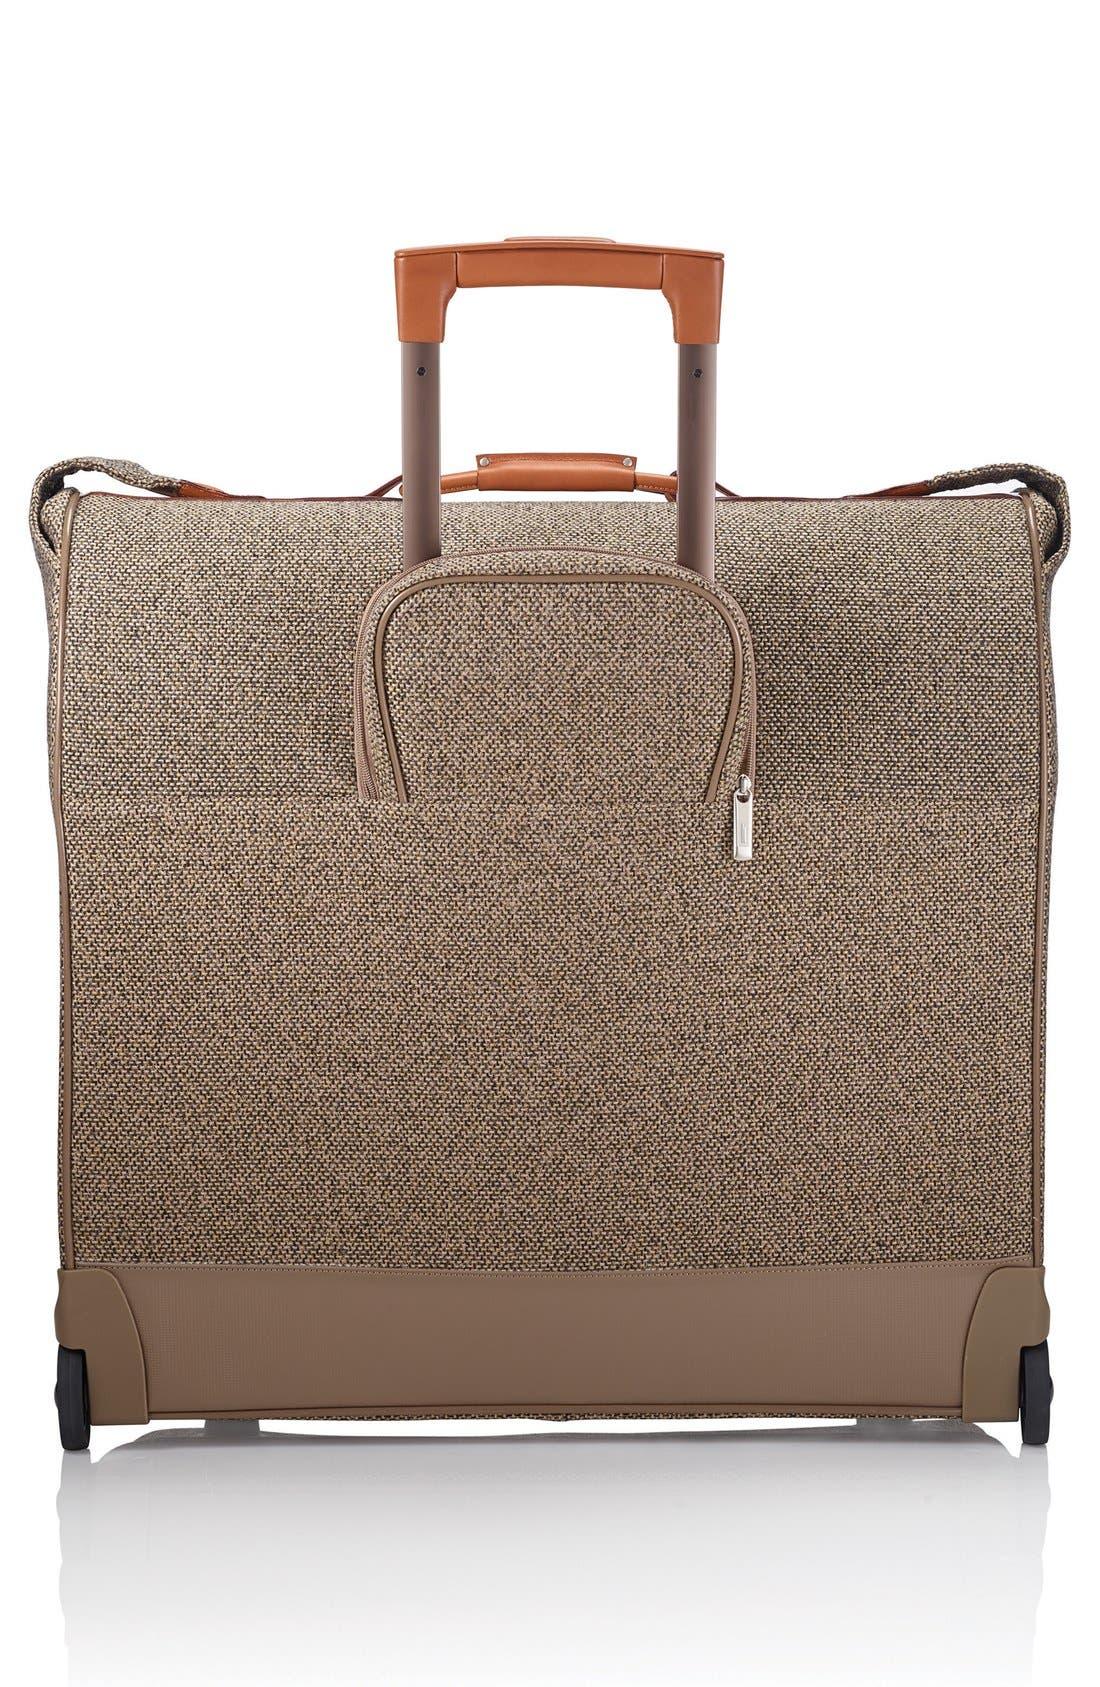 'Tweed Belting' Wheeled Garment Bag,                             Alternate thumbnail 3, color,                             217